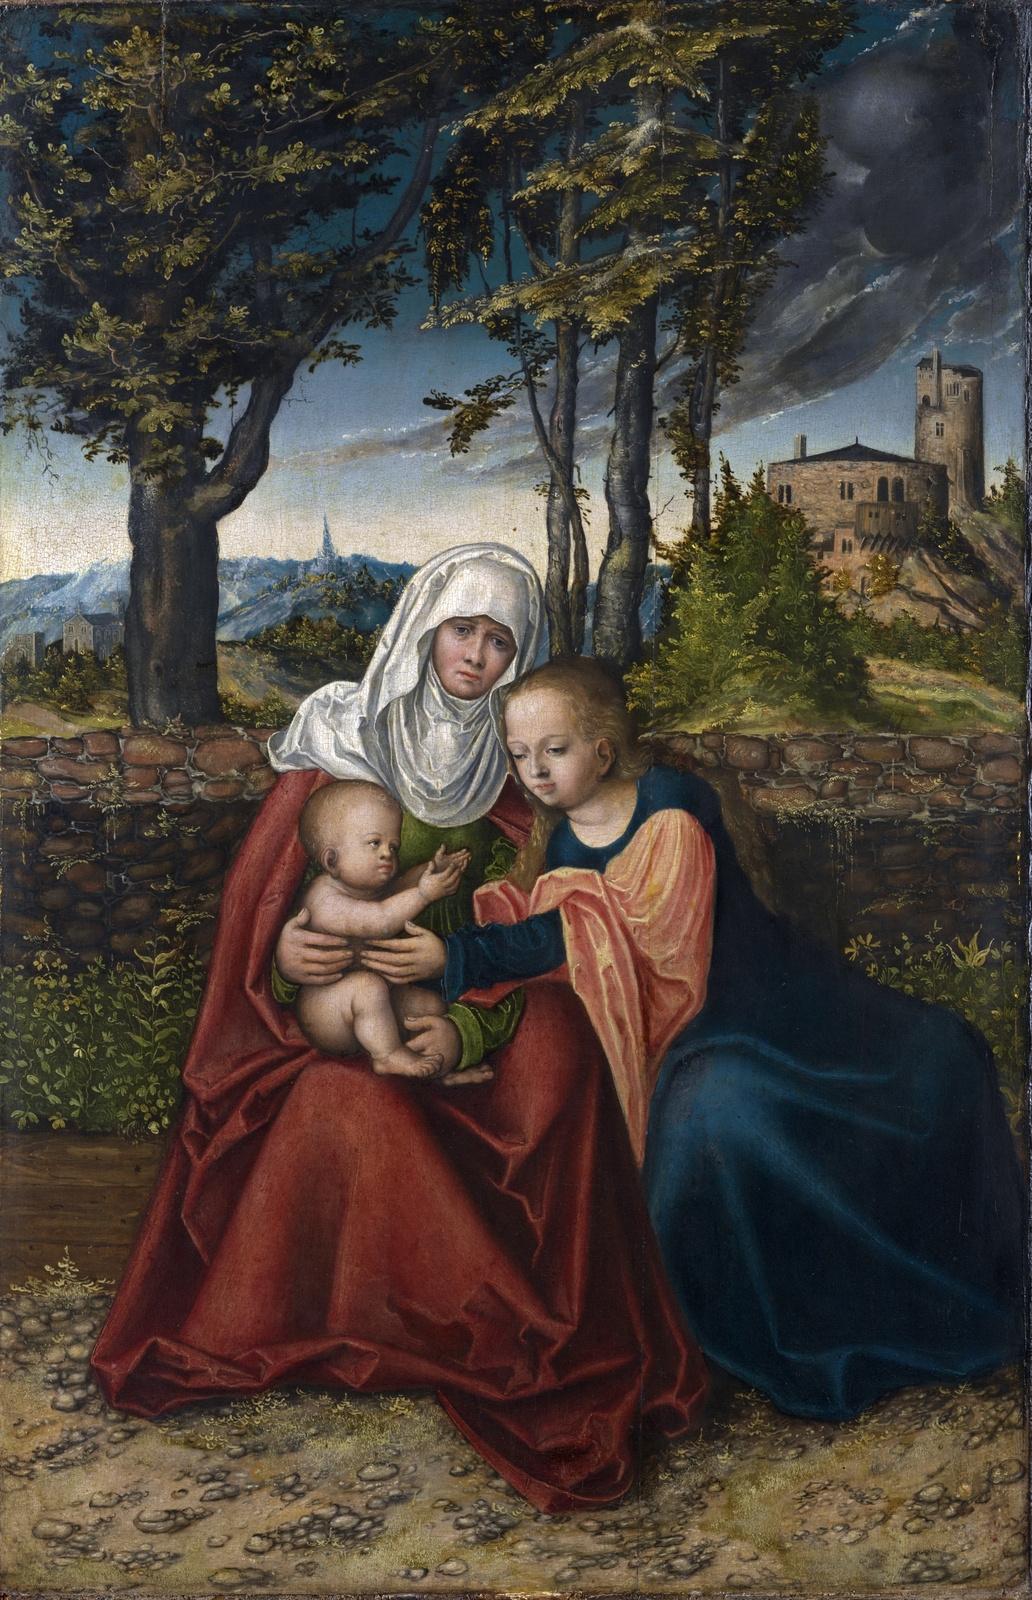 Lucas Cranach the Elder. SV. Anna with Maria and child